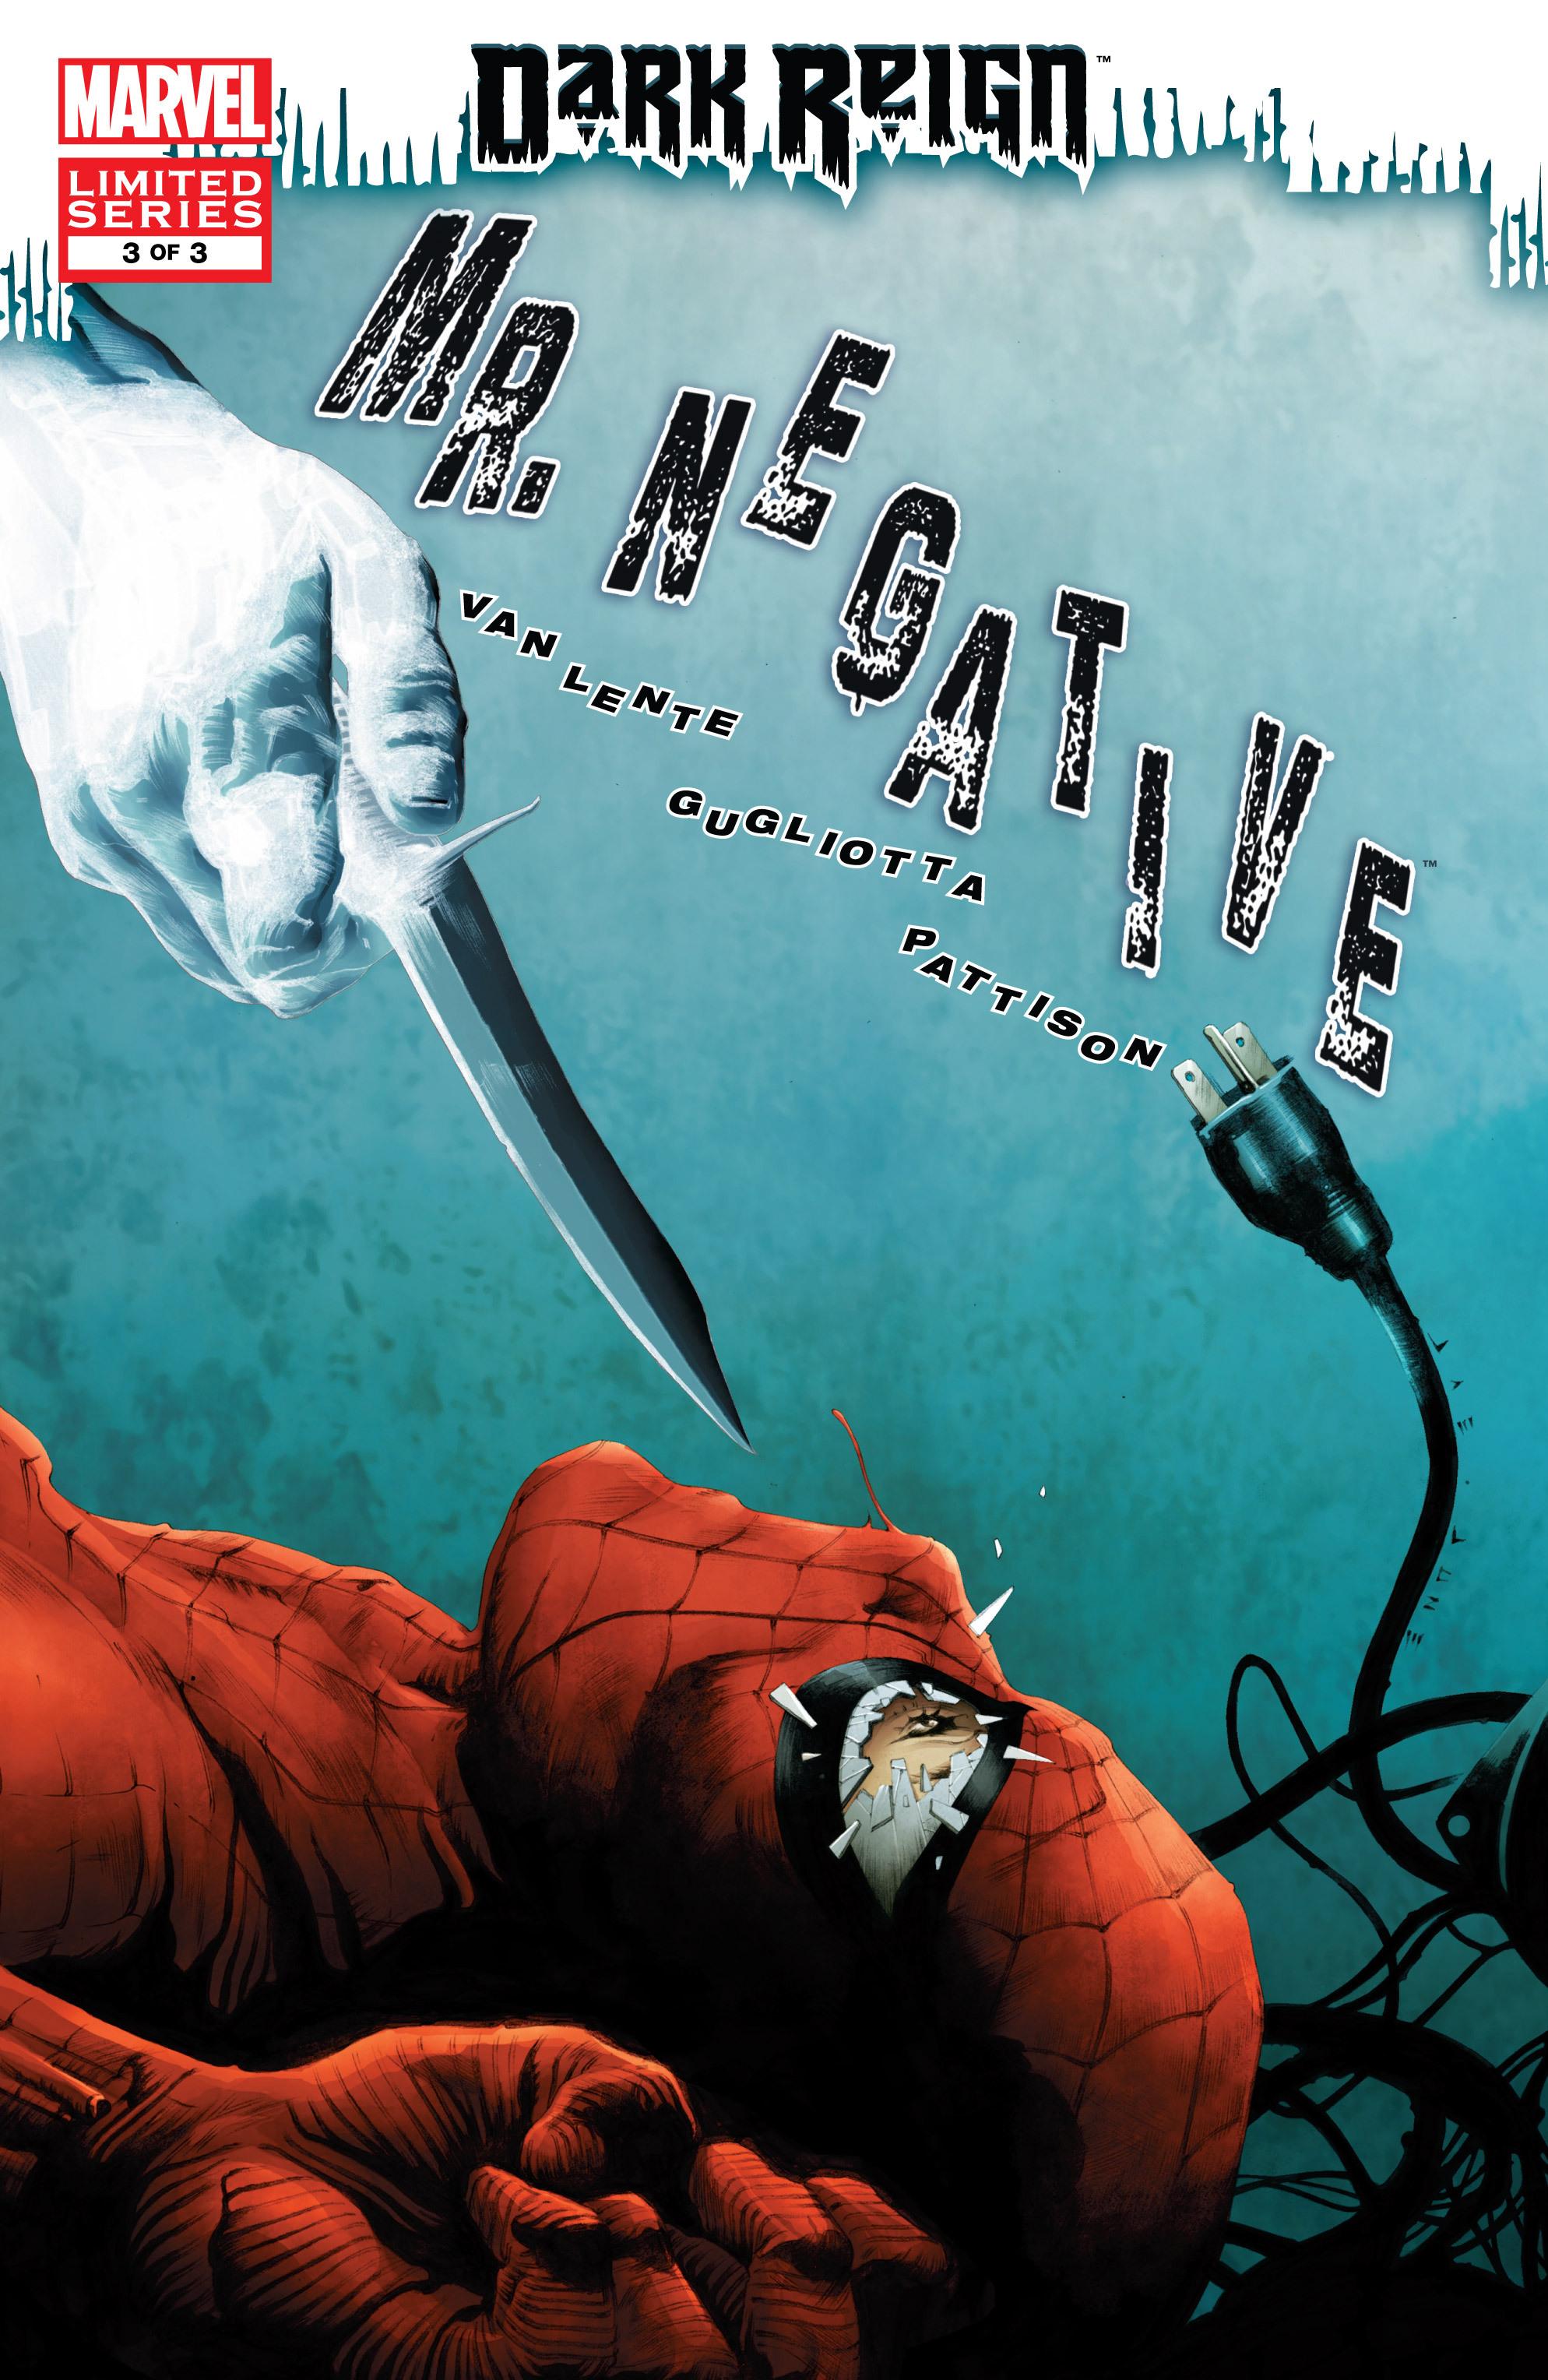 Dark Reign: Mister Negative issue 3 - Page 1